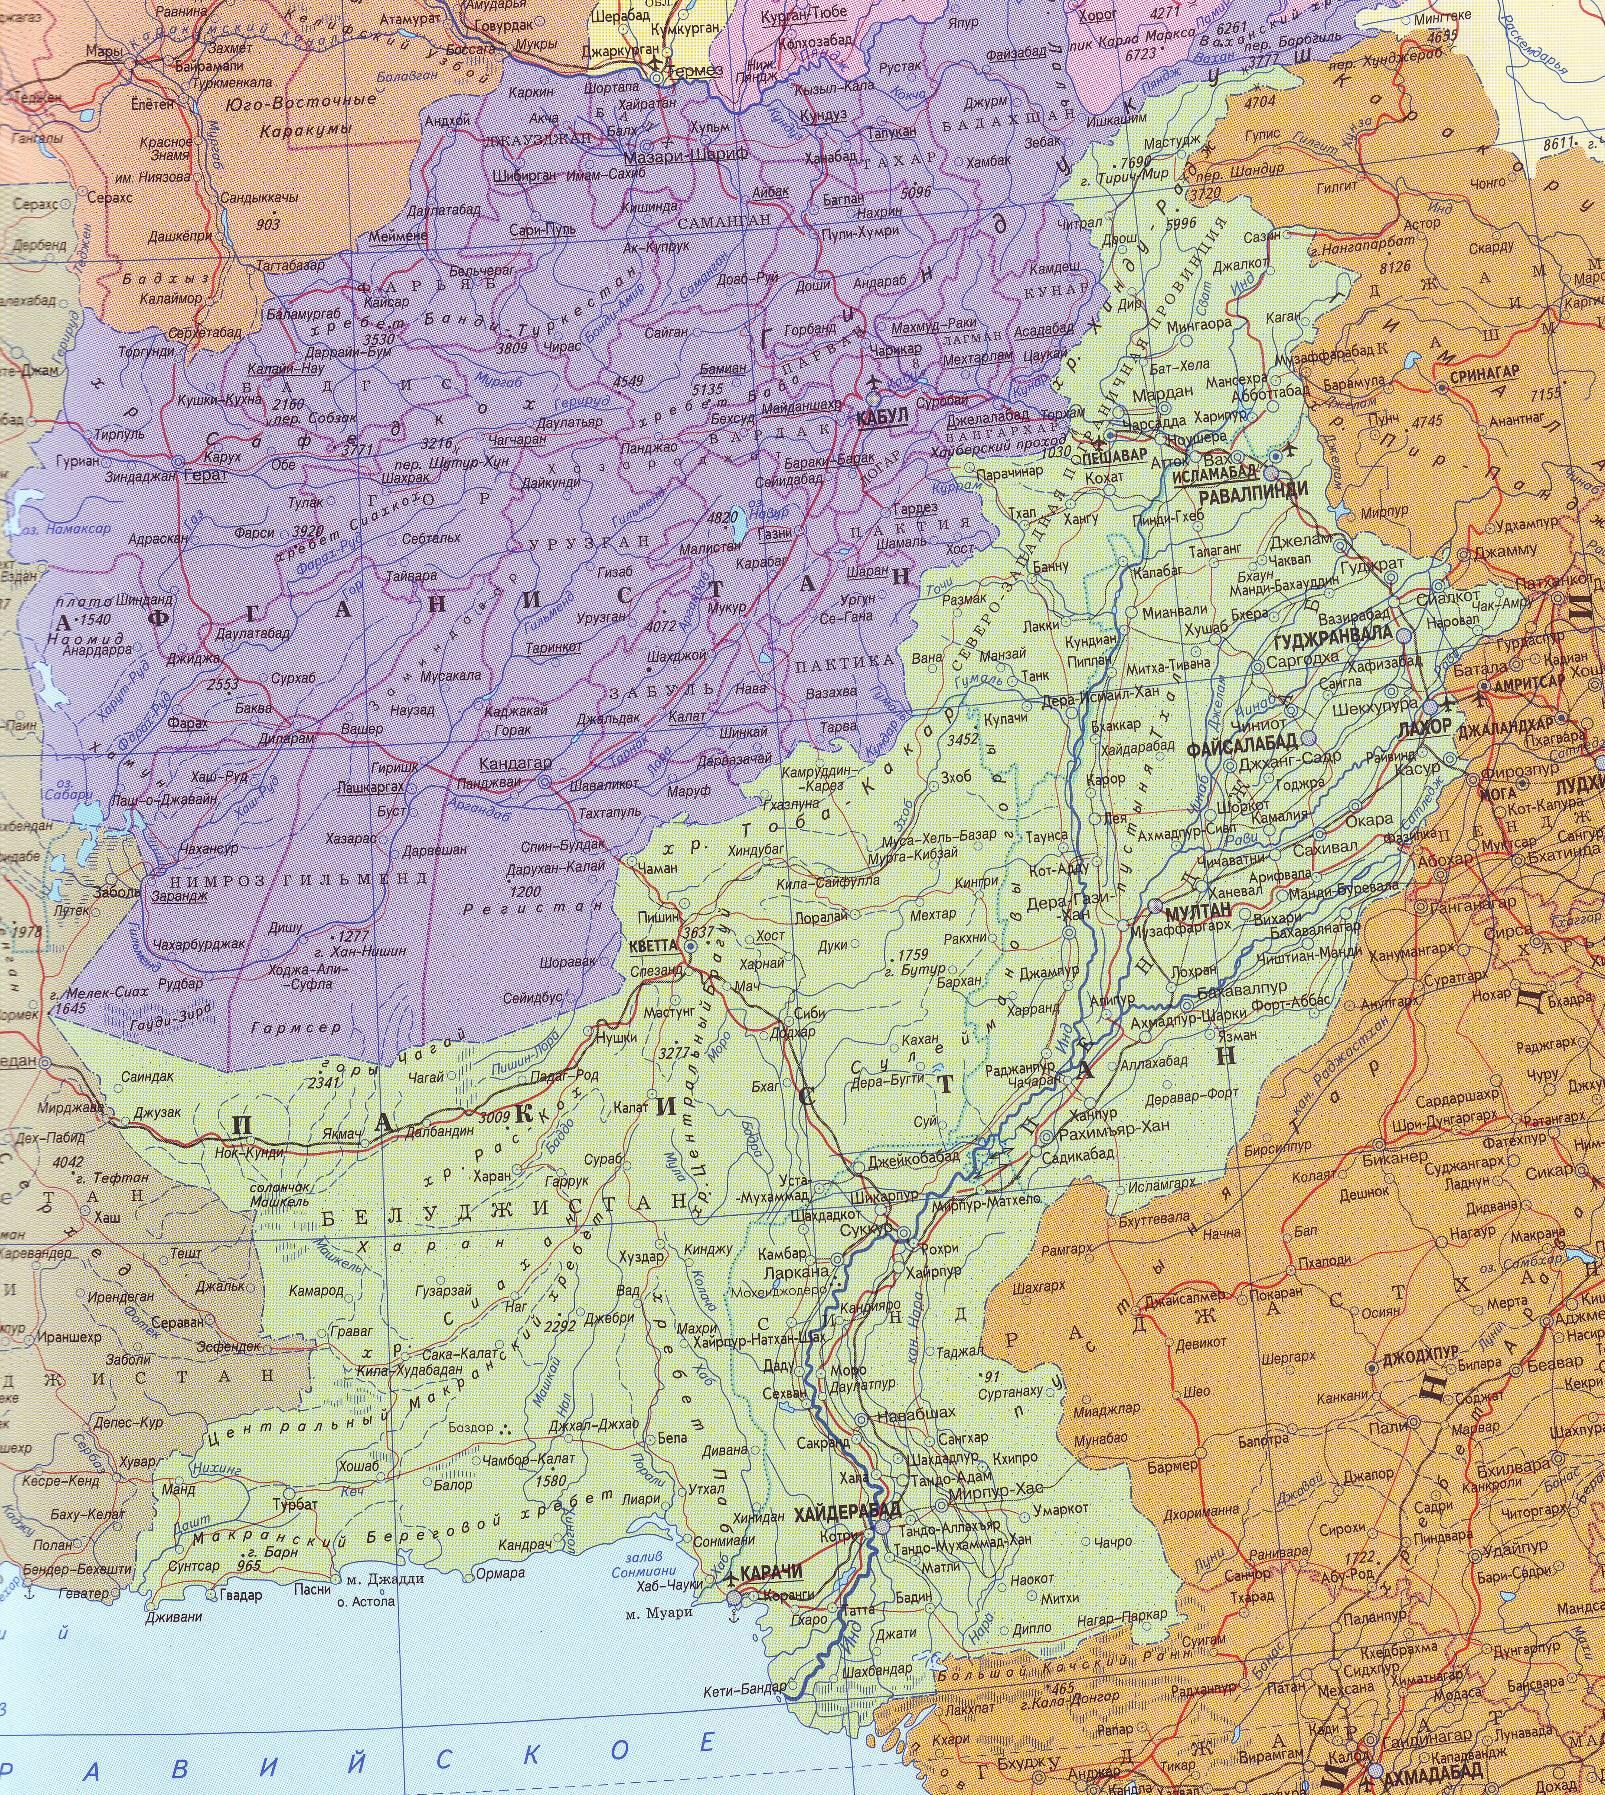 Пакистан на карте | Инфокарт – все карты сети: http://www.infokart.ru/pakistan-na-karte/